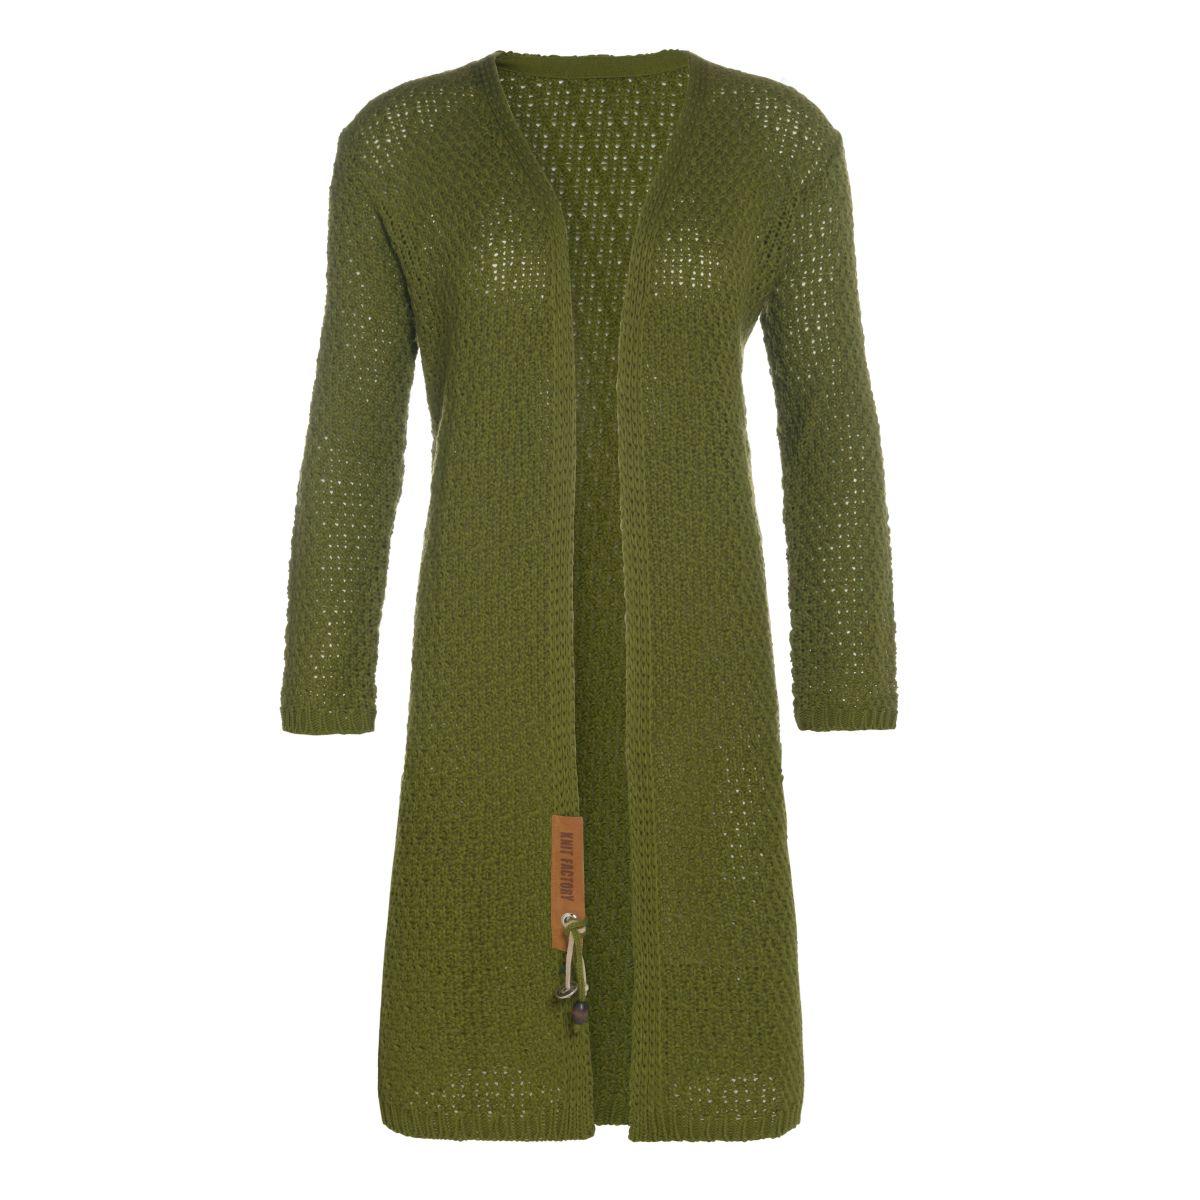 luna long knitted cardigan moss green 3638